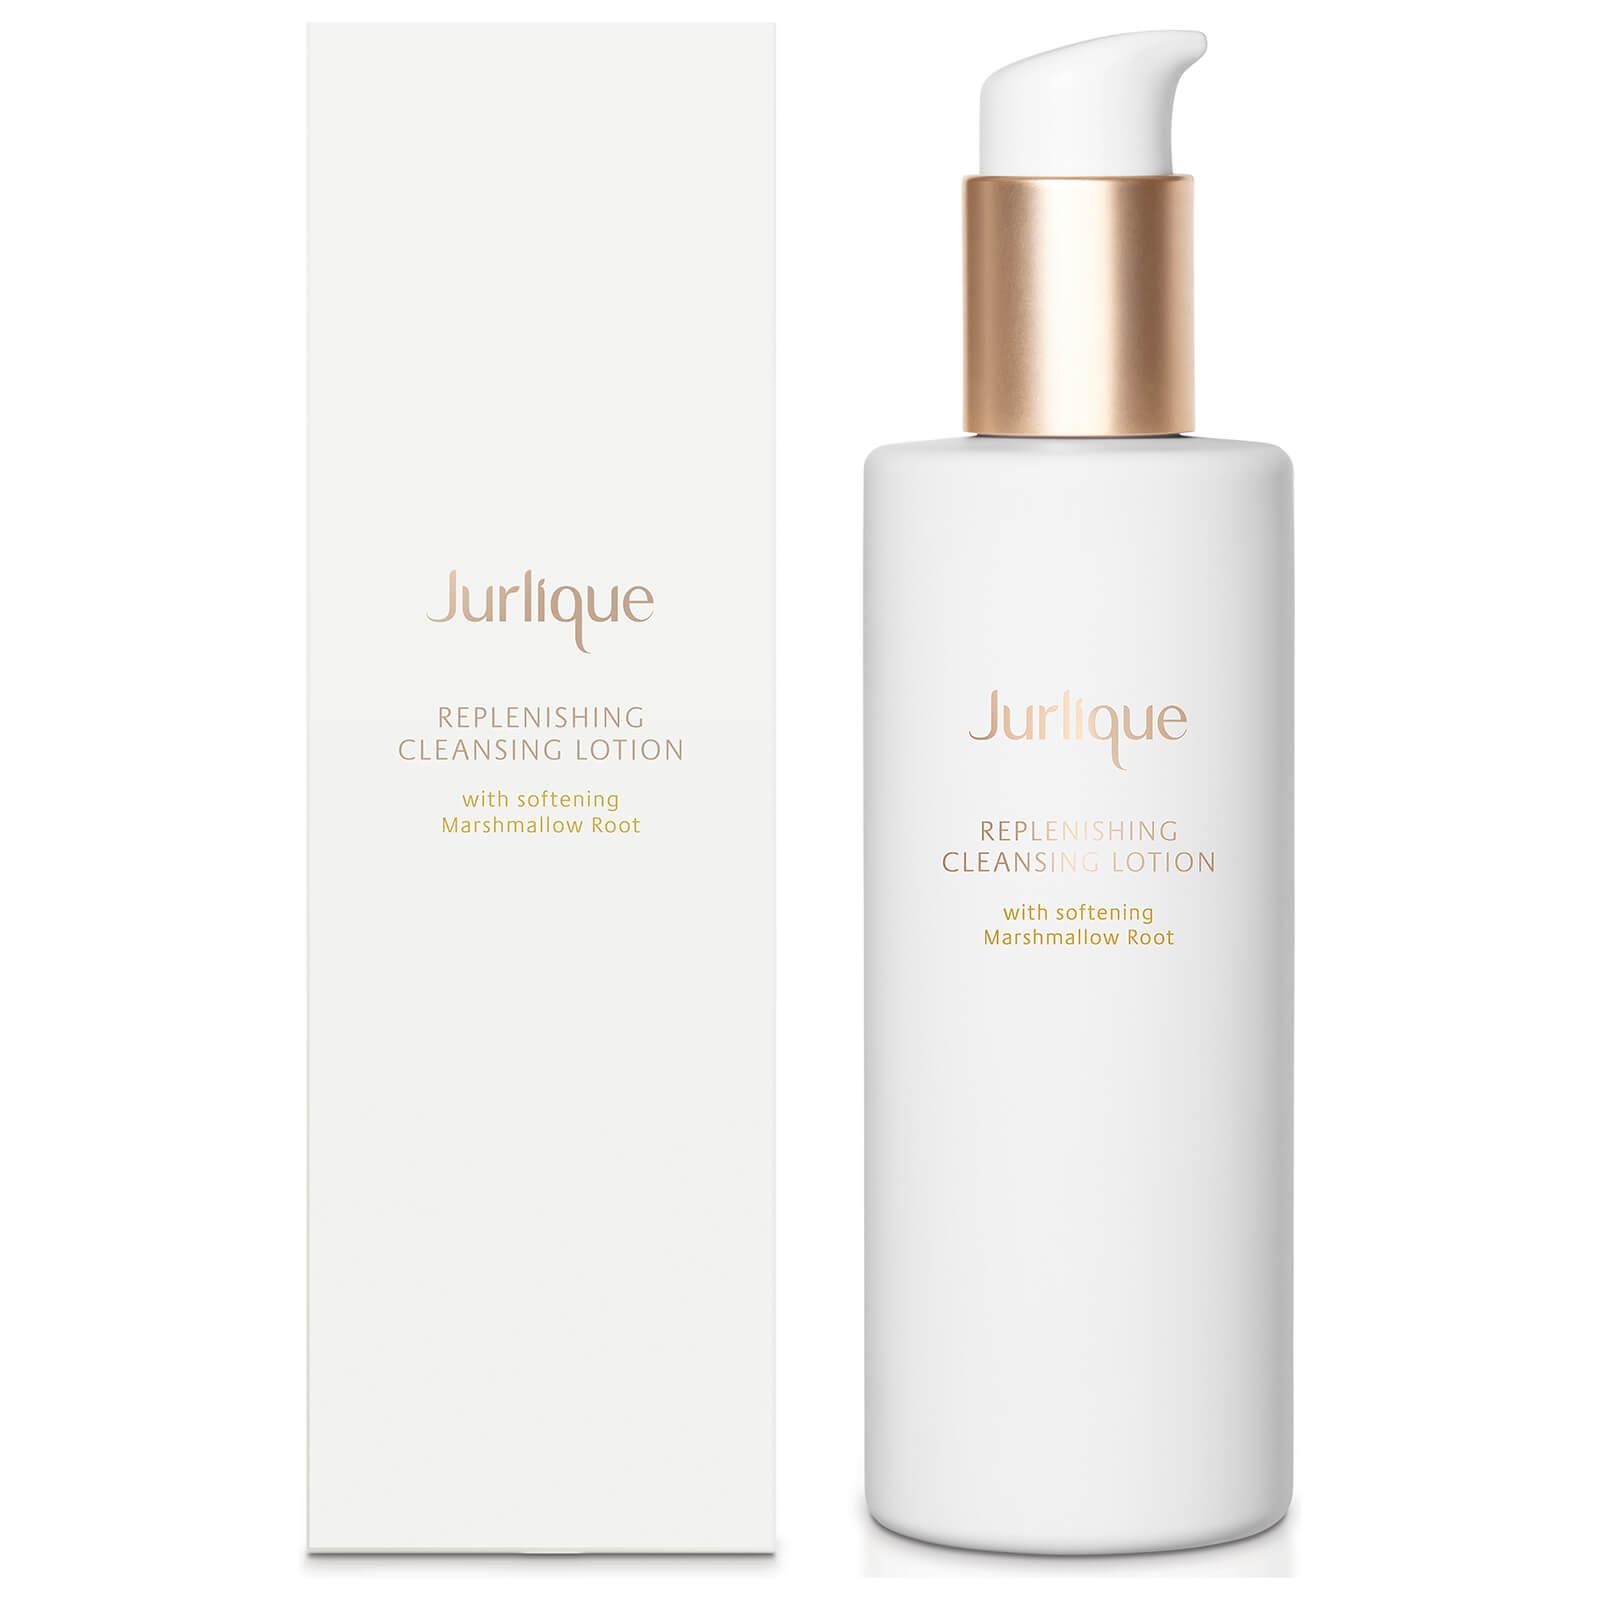 jurlique replenishing cleansing lotion 200ml